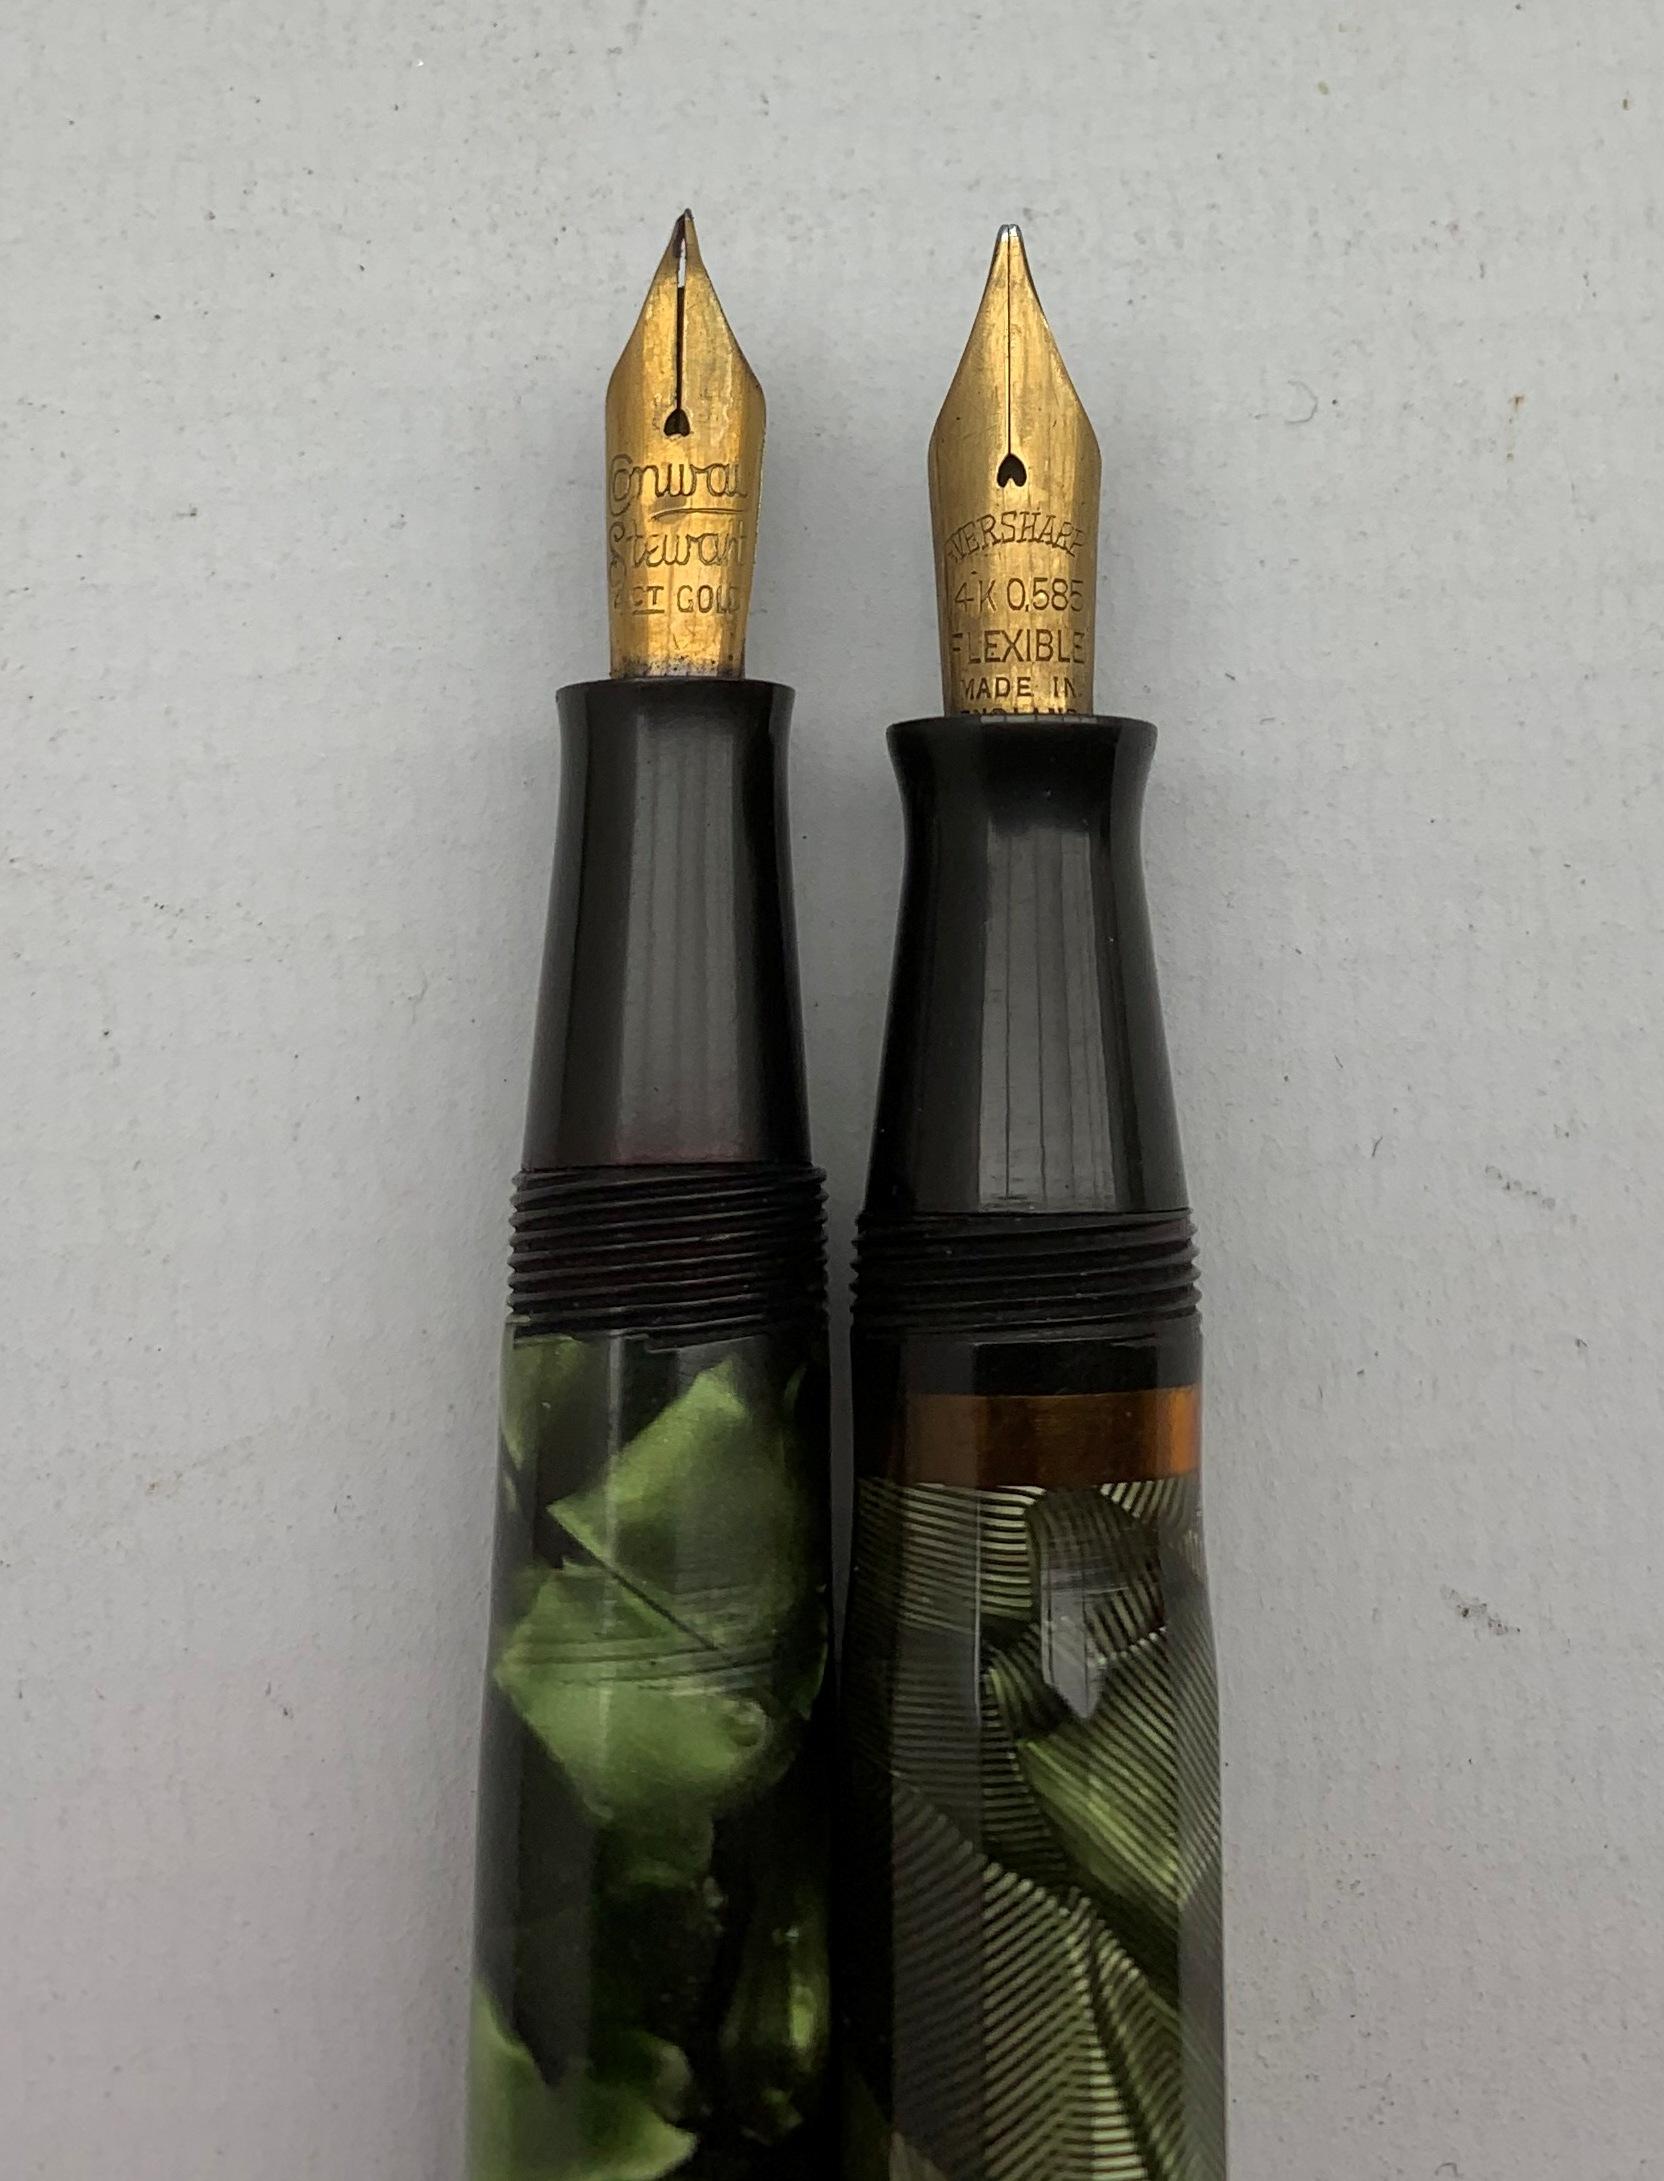 Conaway Stewart 'The Universal Pen' no. 479, Eversharp fountain pen with 14k nib, Eversharp propelli - Image 5 of 5